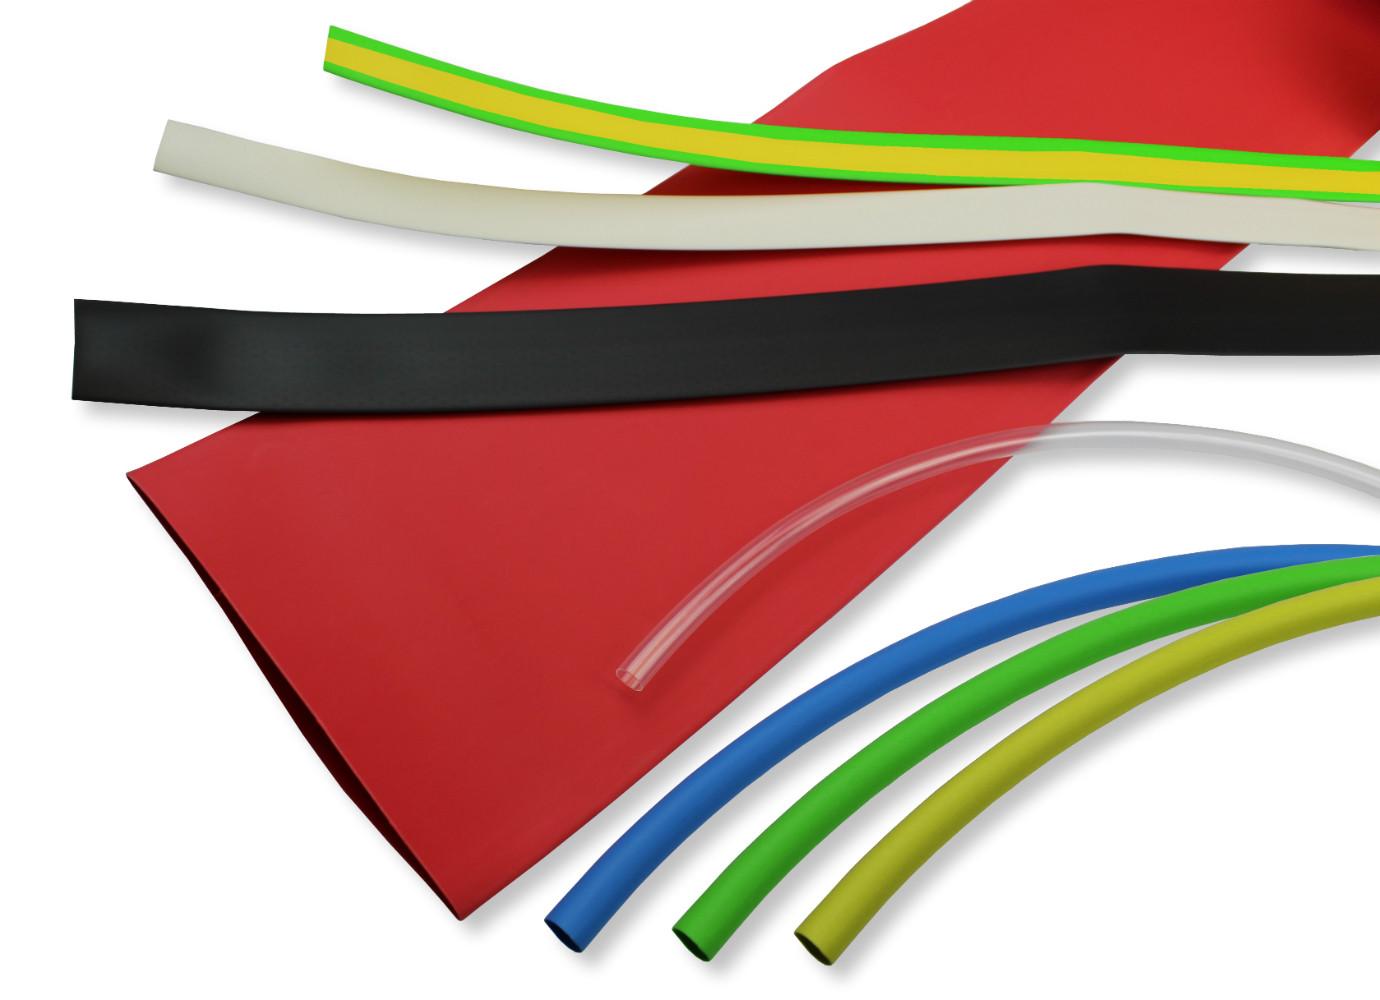 PREMIUM Heat Shrink Tubing 3:1 Ratio HSP3 size 9.0mm I.D / 3.0mm I.D Red